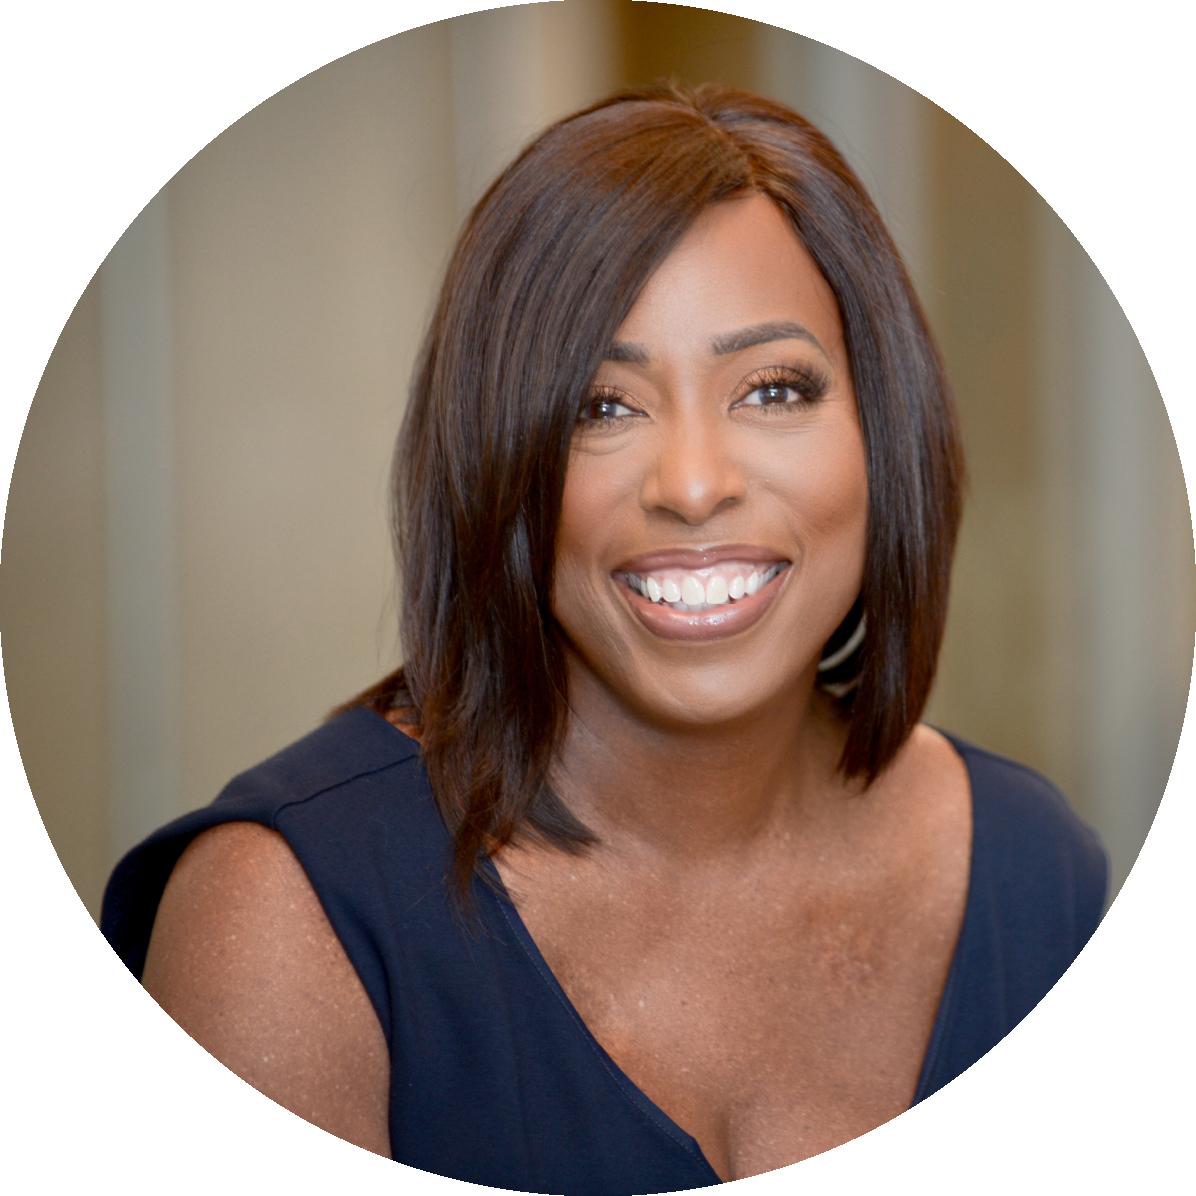 Amelia Ransom, Speaker at Women Impact Tech